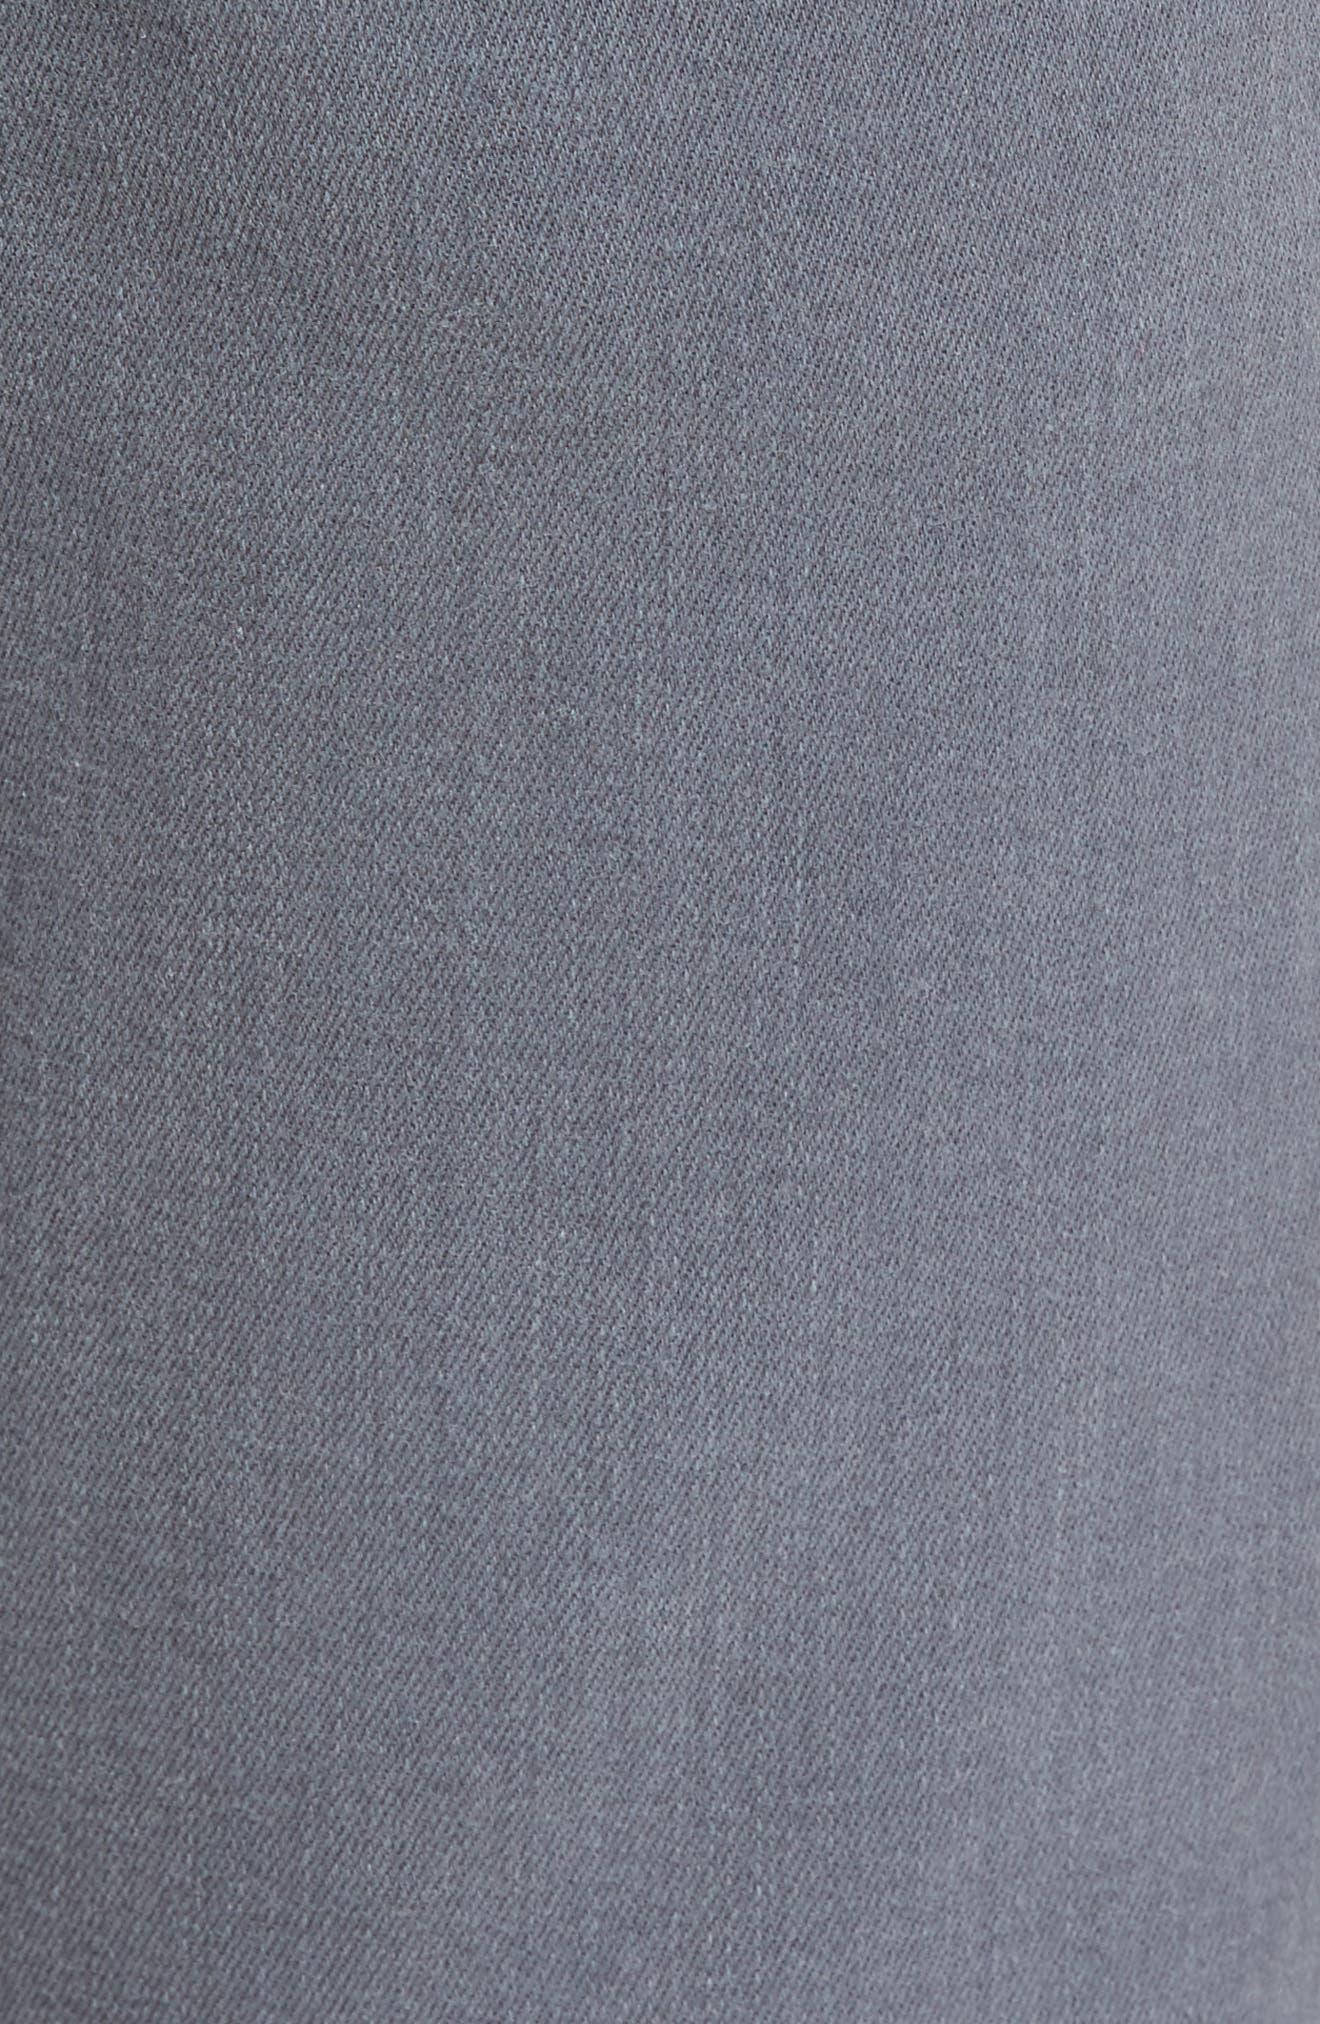 Lennox Slim Fit Jeans,                             Alternate thumbnail 5, color,